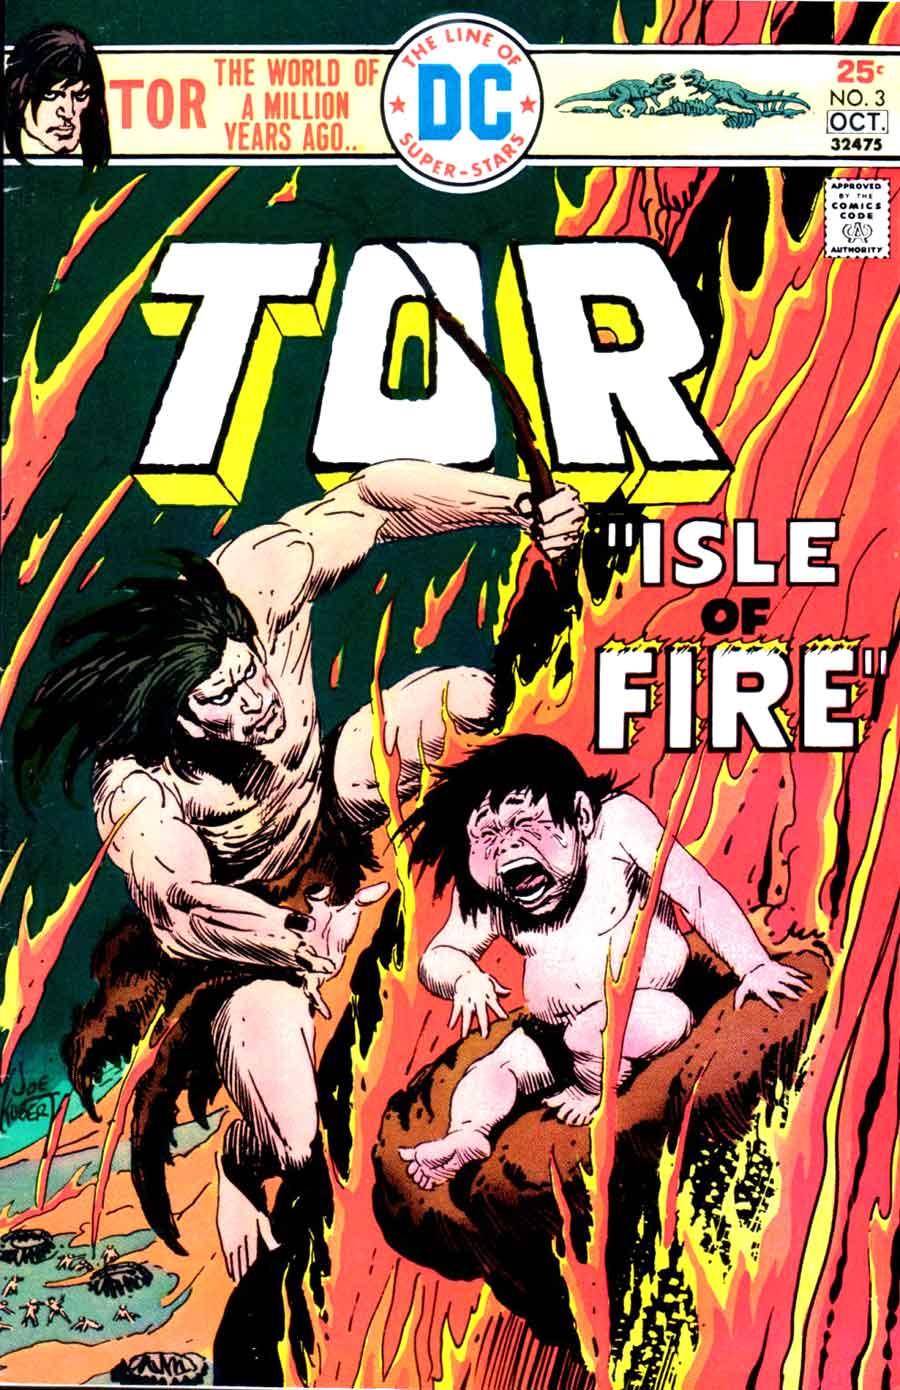 Tor v2 #3 dc bronze age comic book cover art by Joe Kubert